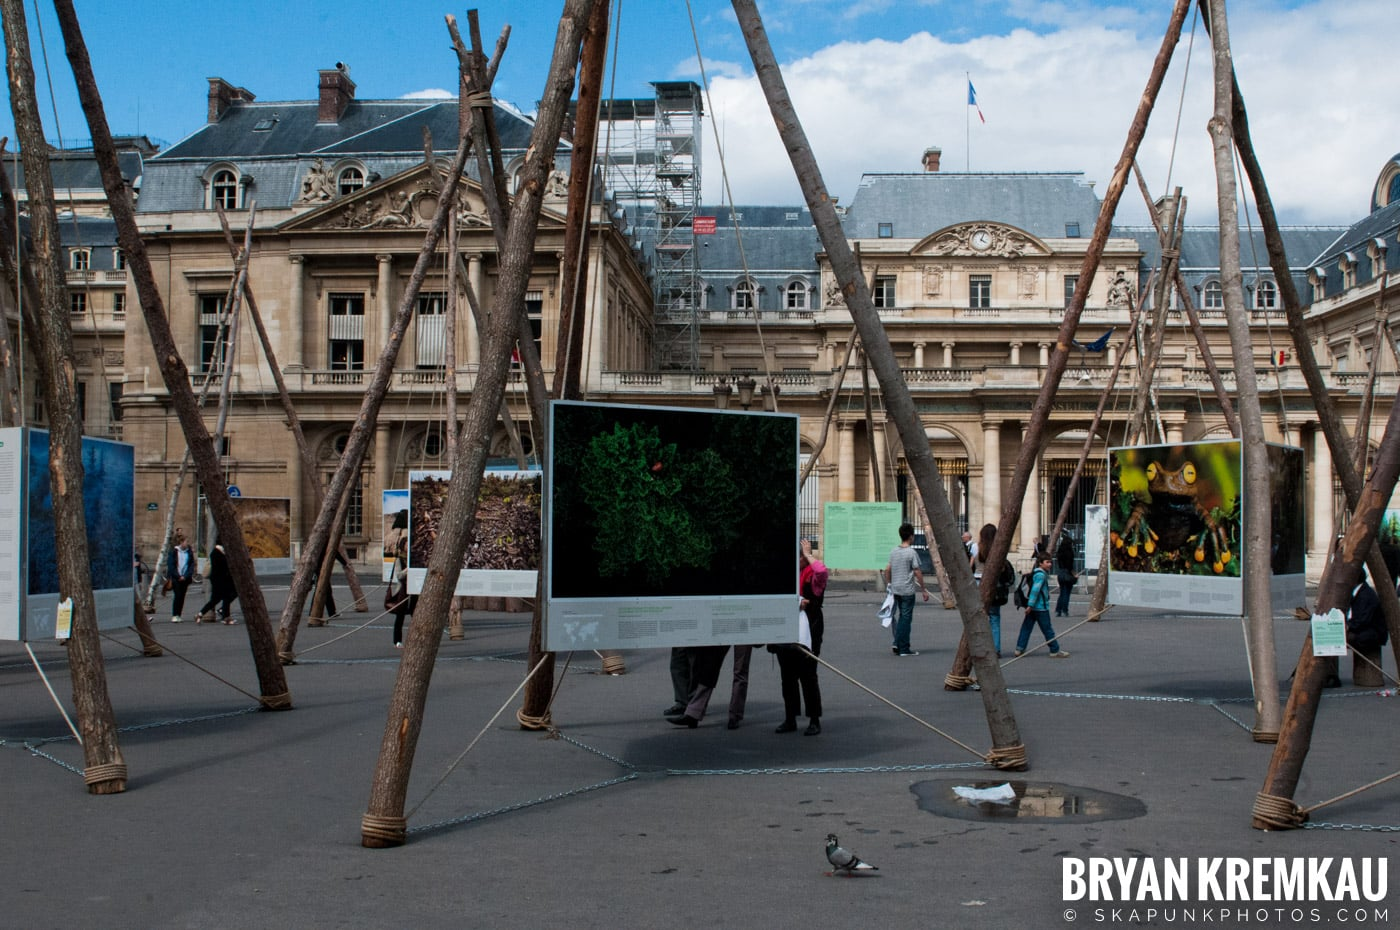 Paris, France Honeymoon - Day 4 - 7.21.11 (11)